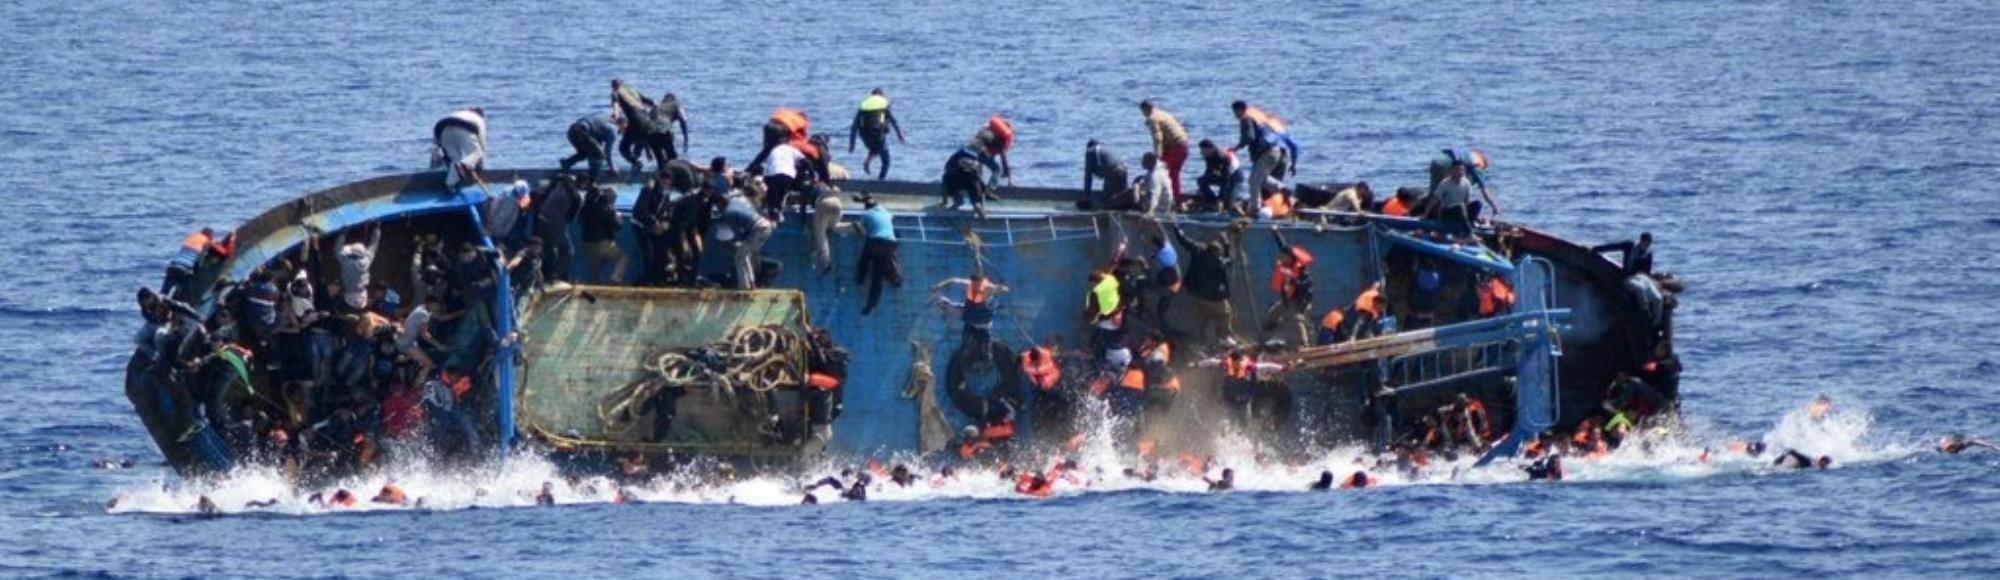 between-700-900-migrants-may-have-died-at-sea-this-week-ngos-1464532263